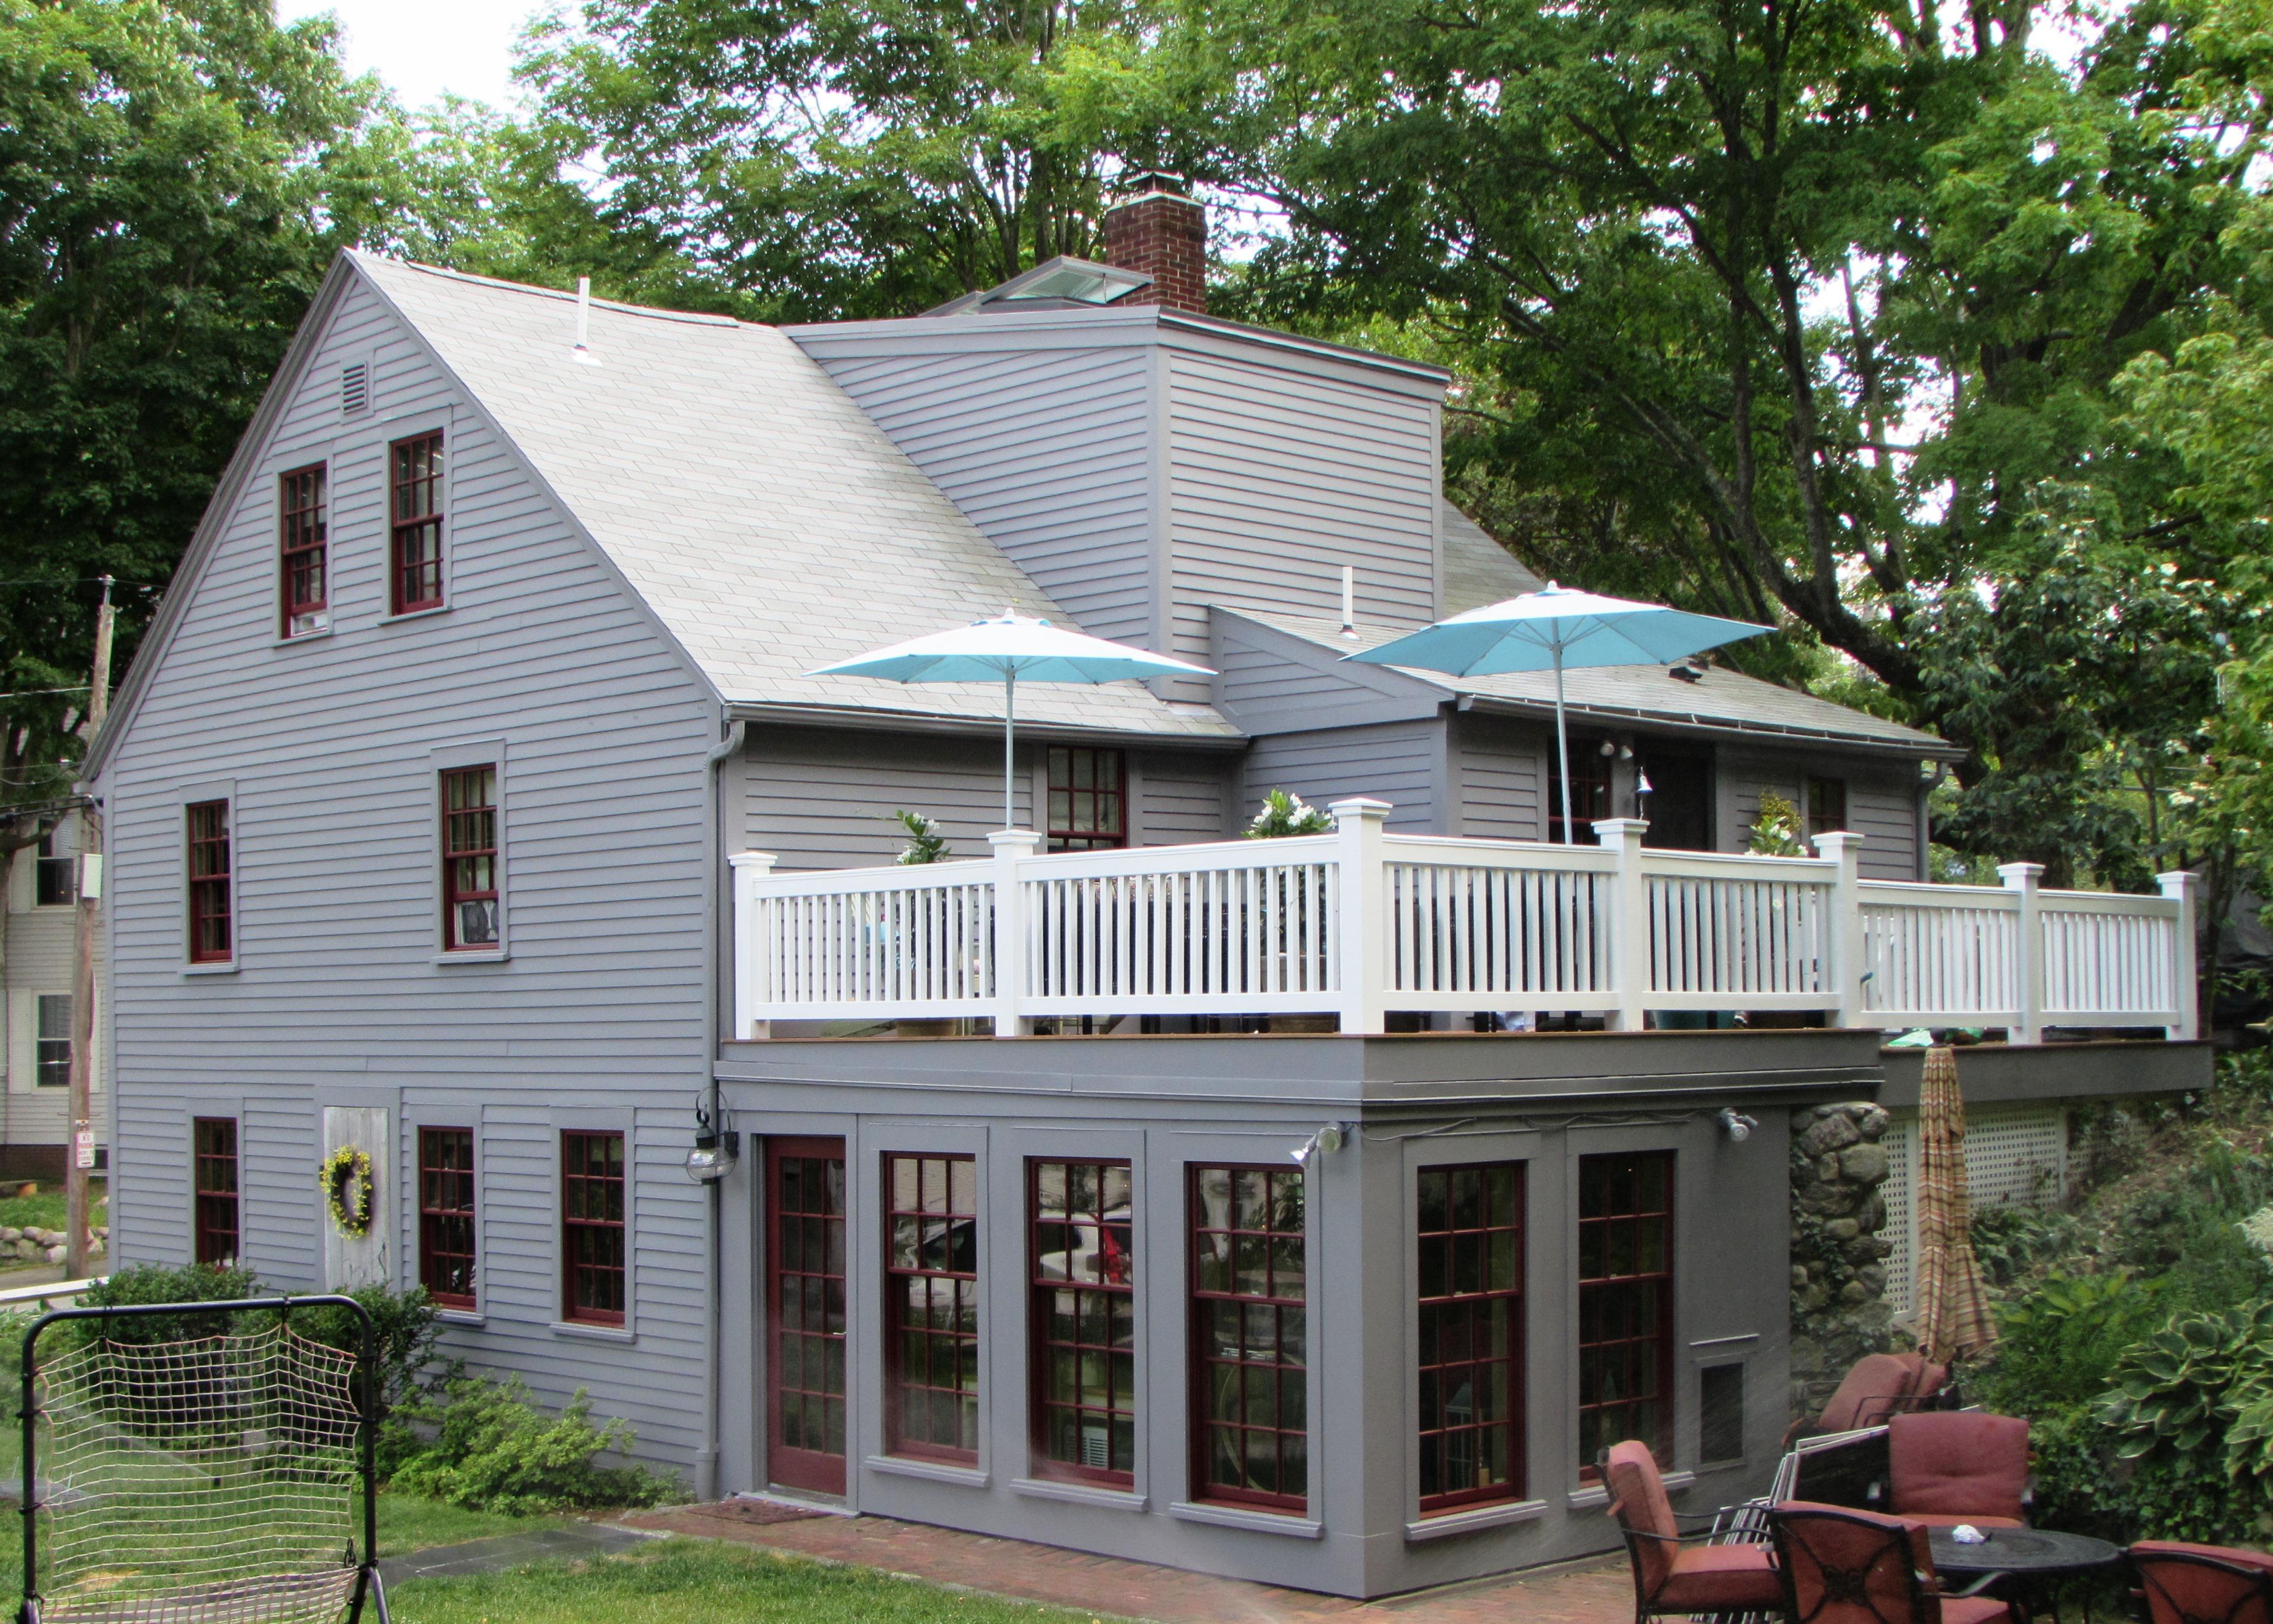 Exterior repairs quality exterior repairs in massachusetts call joe for 30 - Exterior home repairs ...